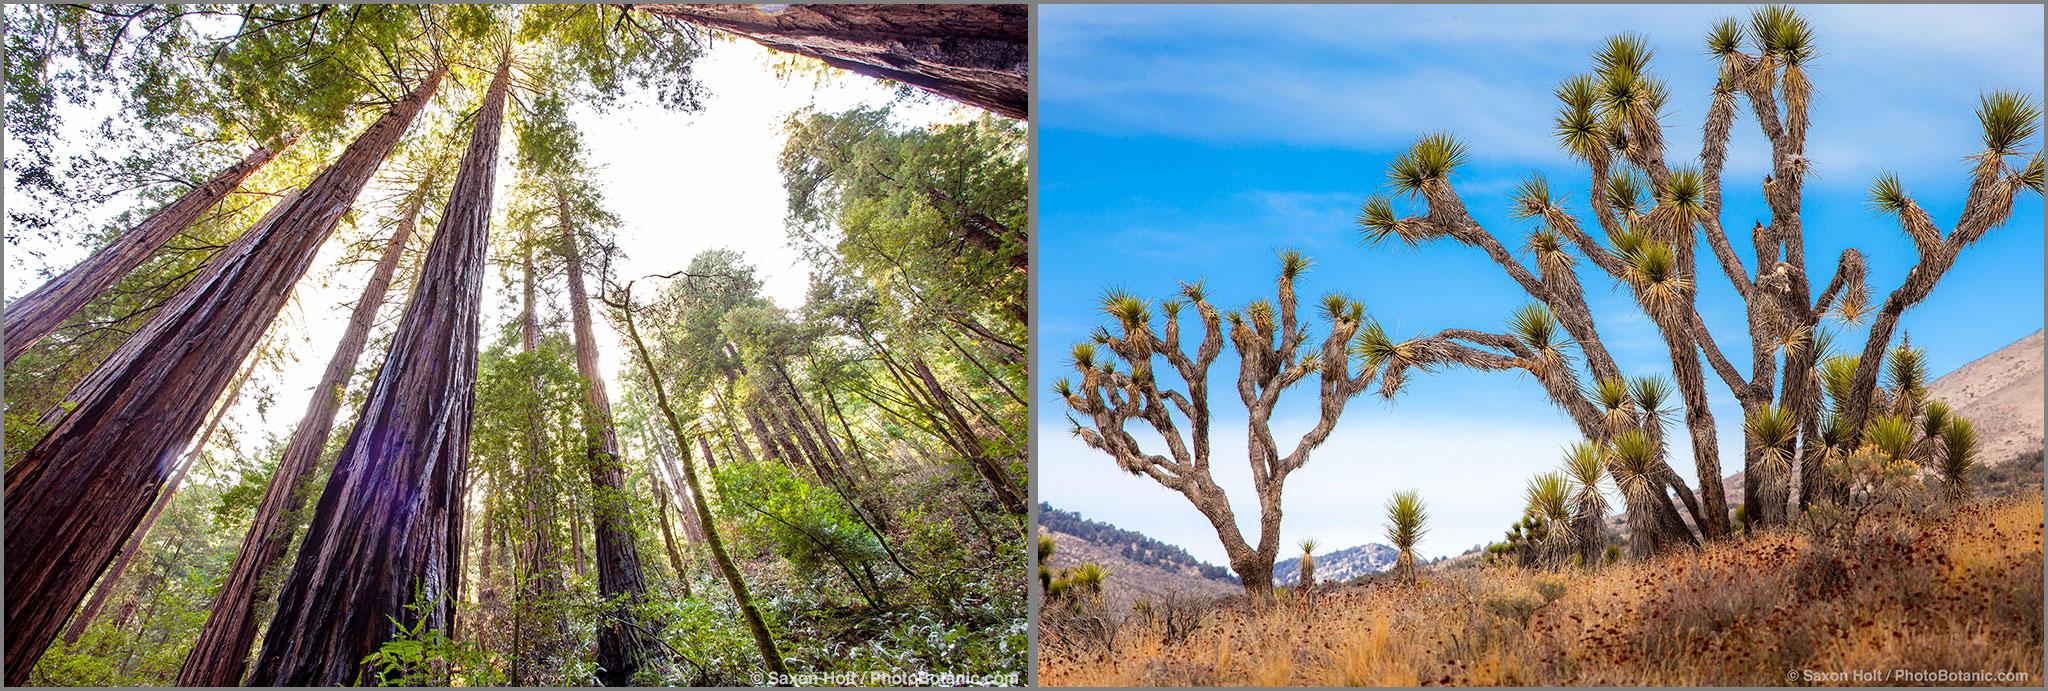 Redwood Trees, Sequoia sempervirens, in Muir Woods